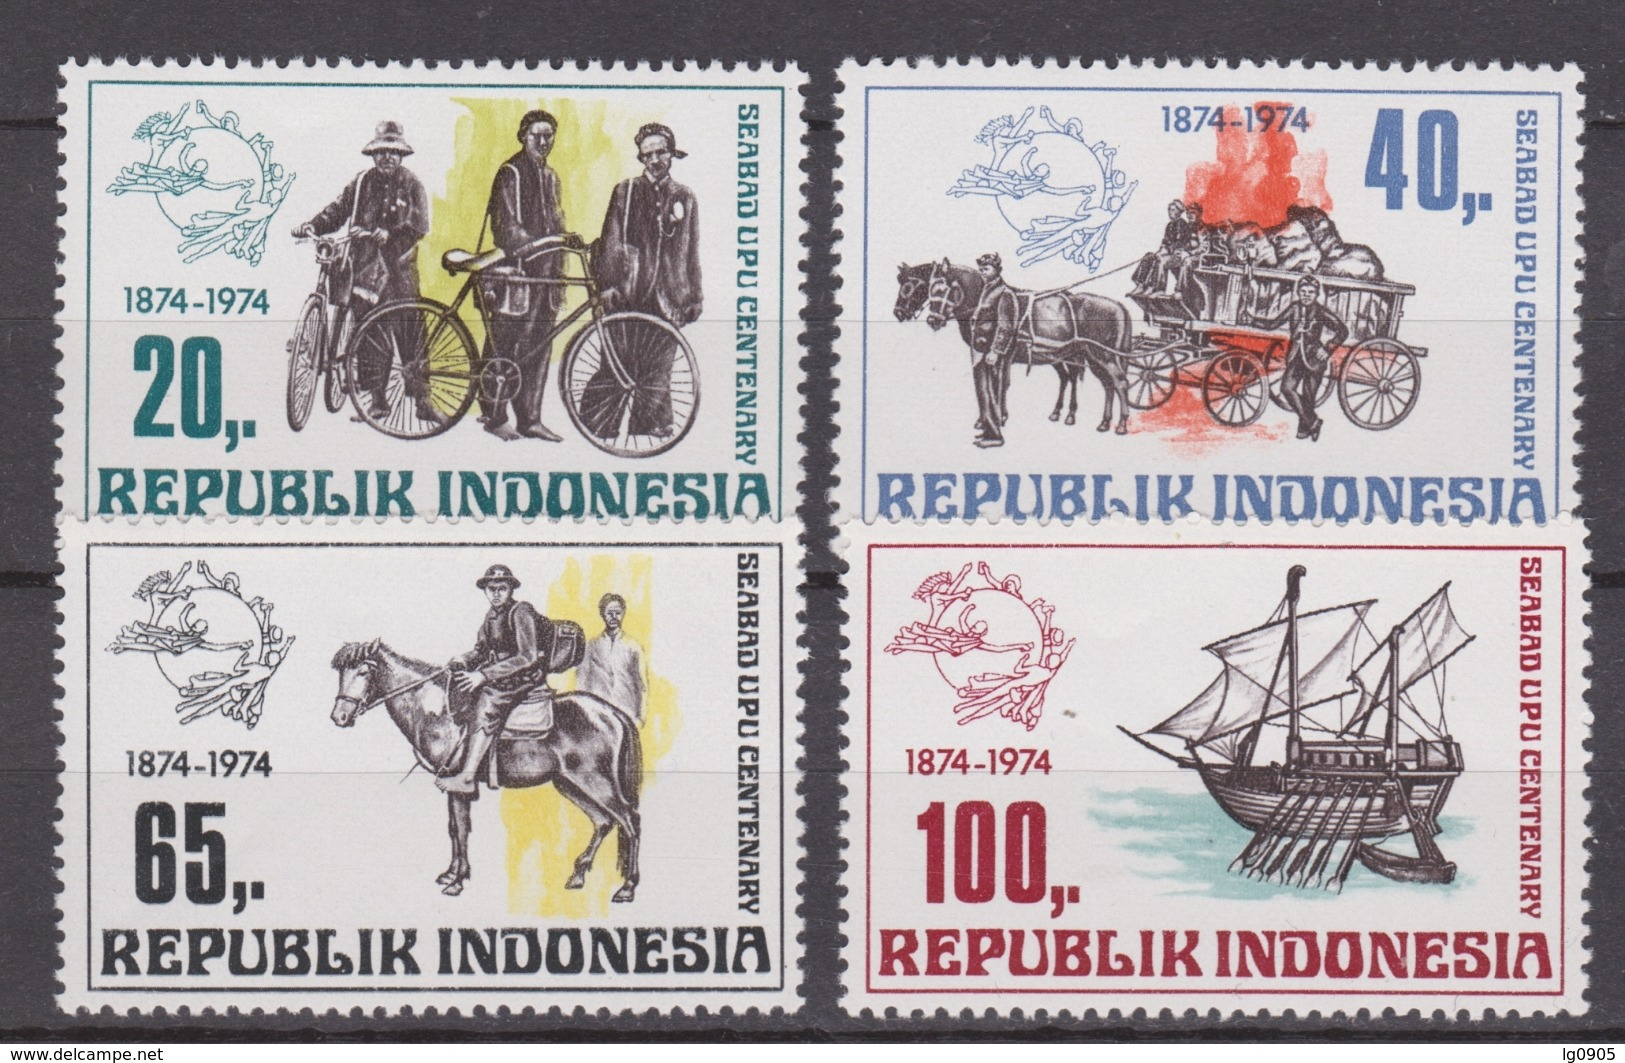 Indonesia Indonesie 799-802 MNH 100 Jaar Wereld Post Vereniging 1974 ; NOW MANY STAMPS INDONESIA VERY CHEAP - Indonesië